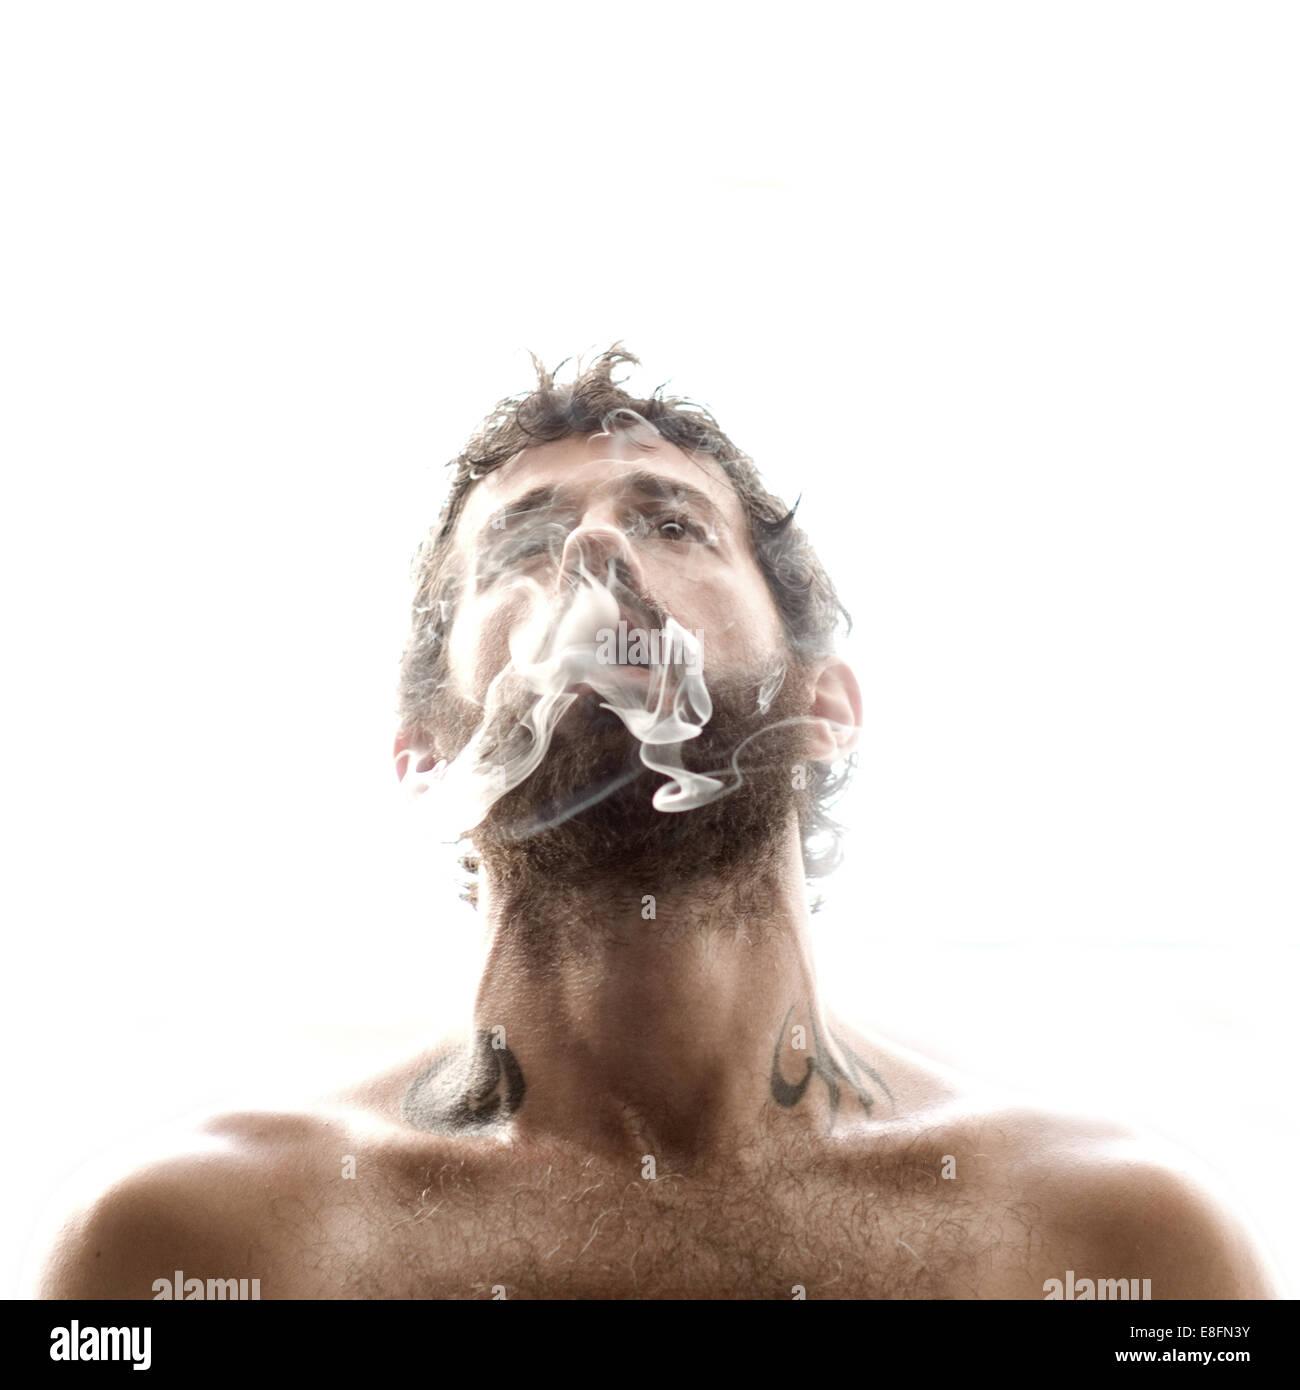 mann rauch ausatmen stockbild - Ausatmen Fans Usa